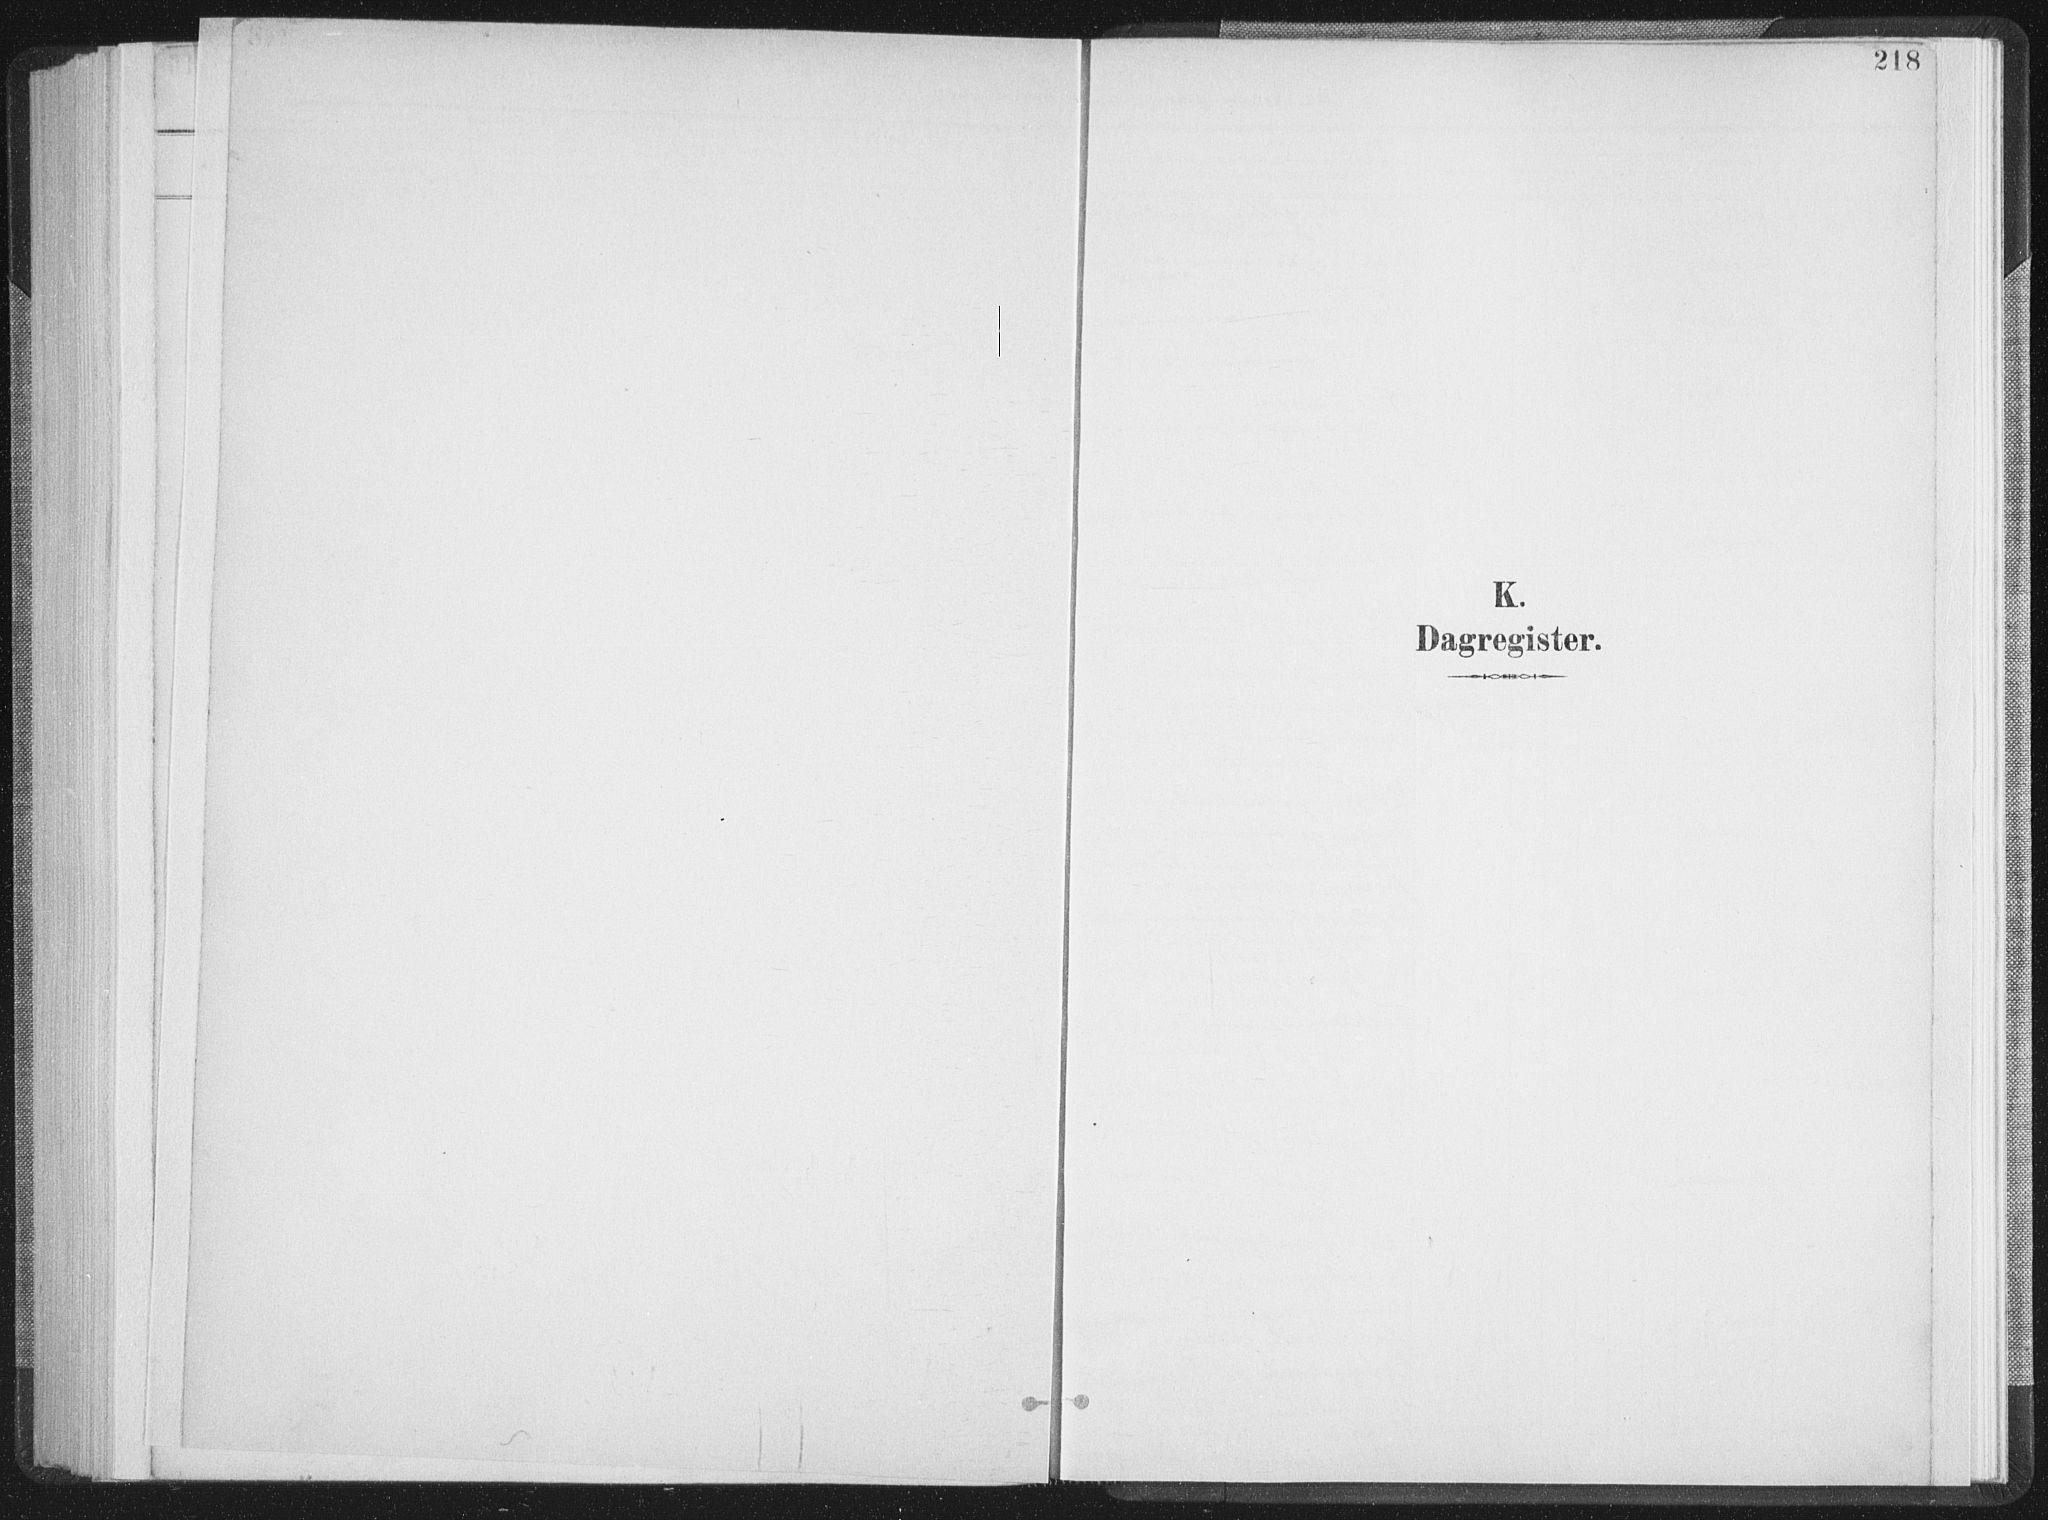 SAT, Ministerialprotokoller, klokkerbøker og fødselsregistre - Nordland, 897/L1400: Ministerialbok nr. 897A07, 1897-1908, s. 218